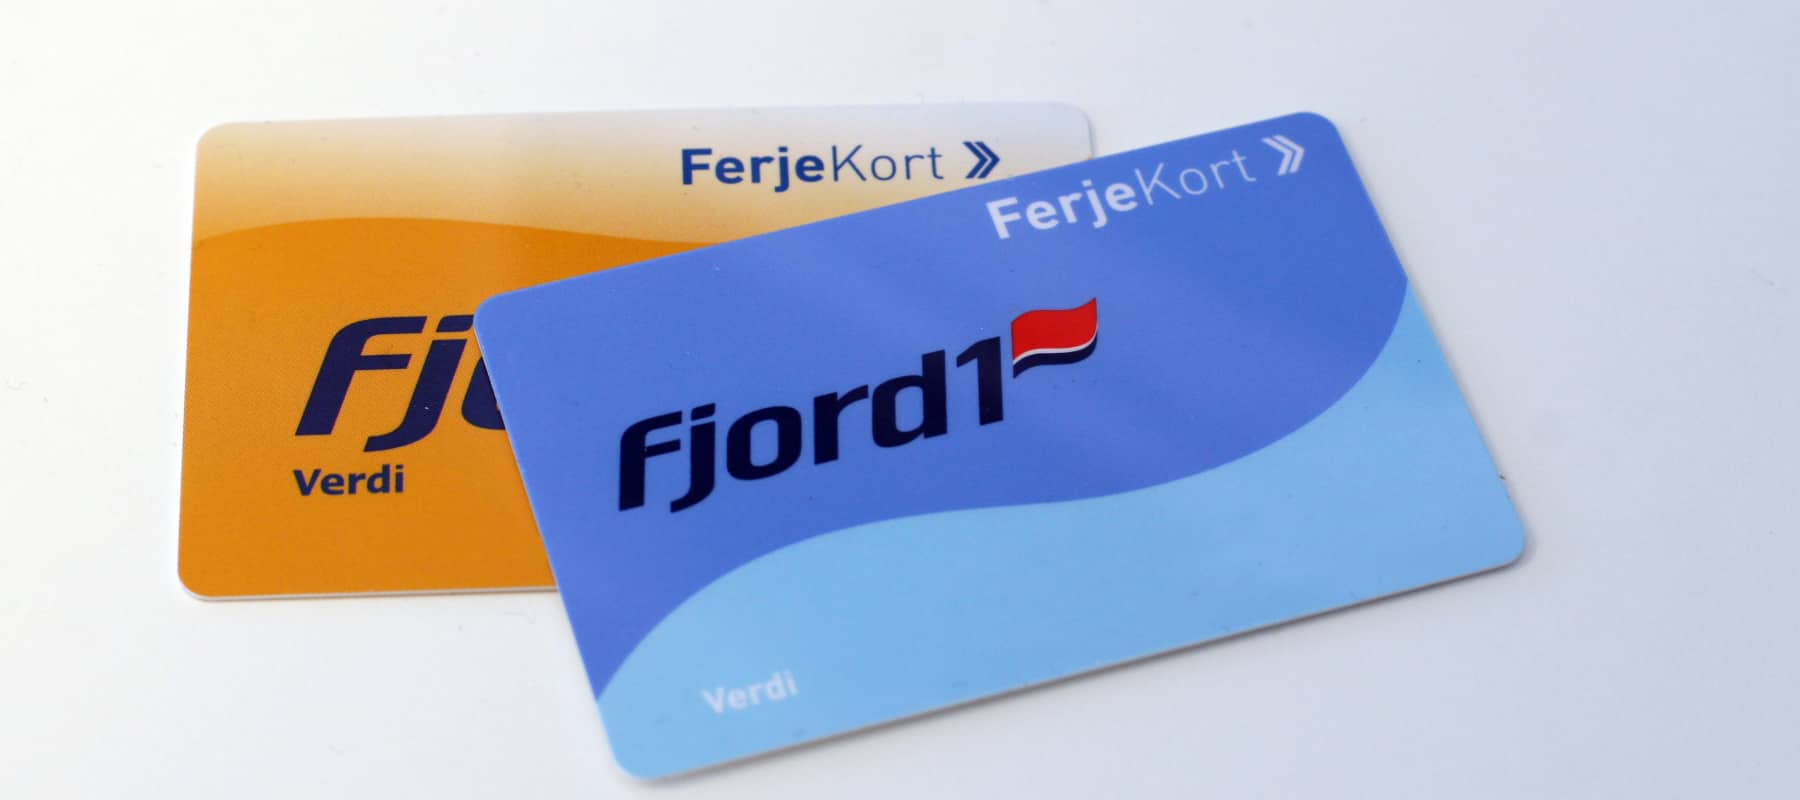 Alte Fjord1-Karte